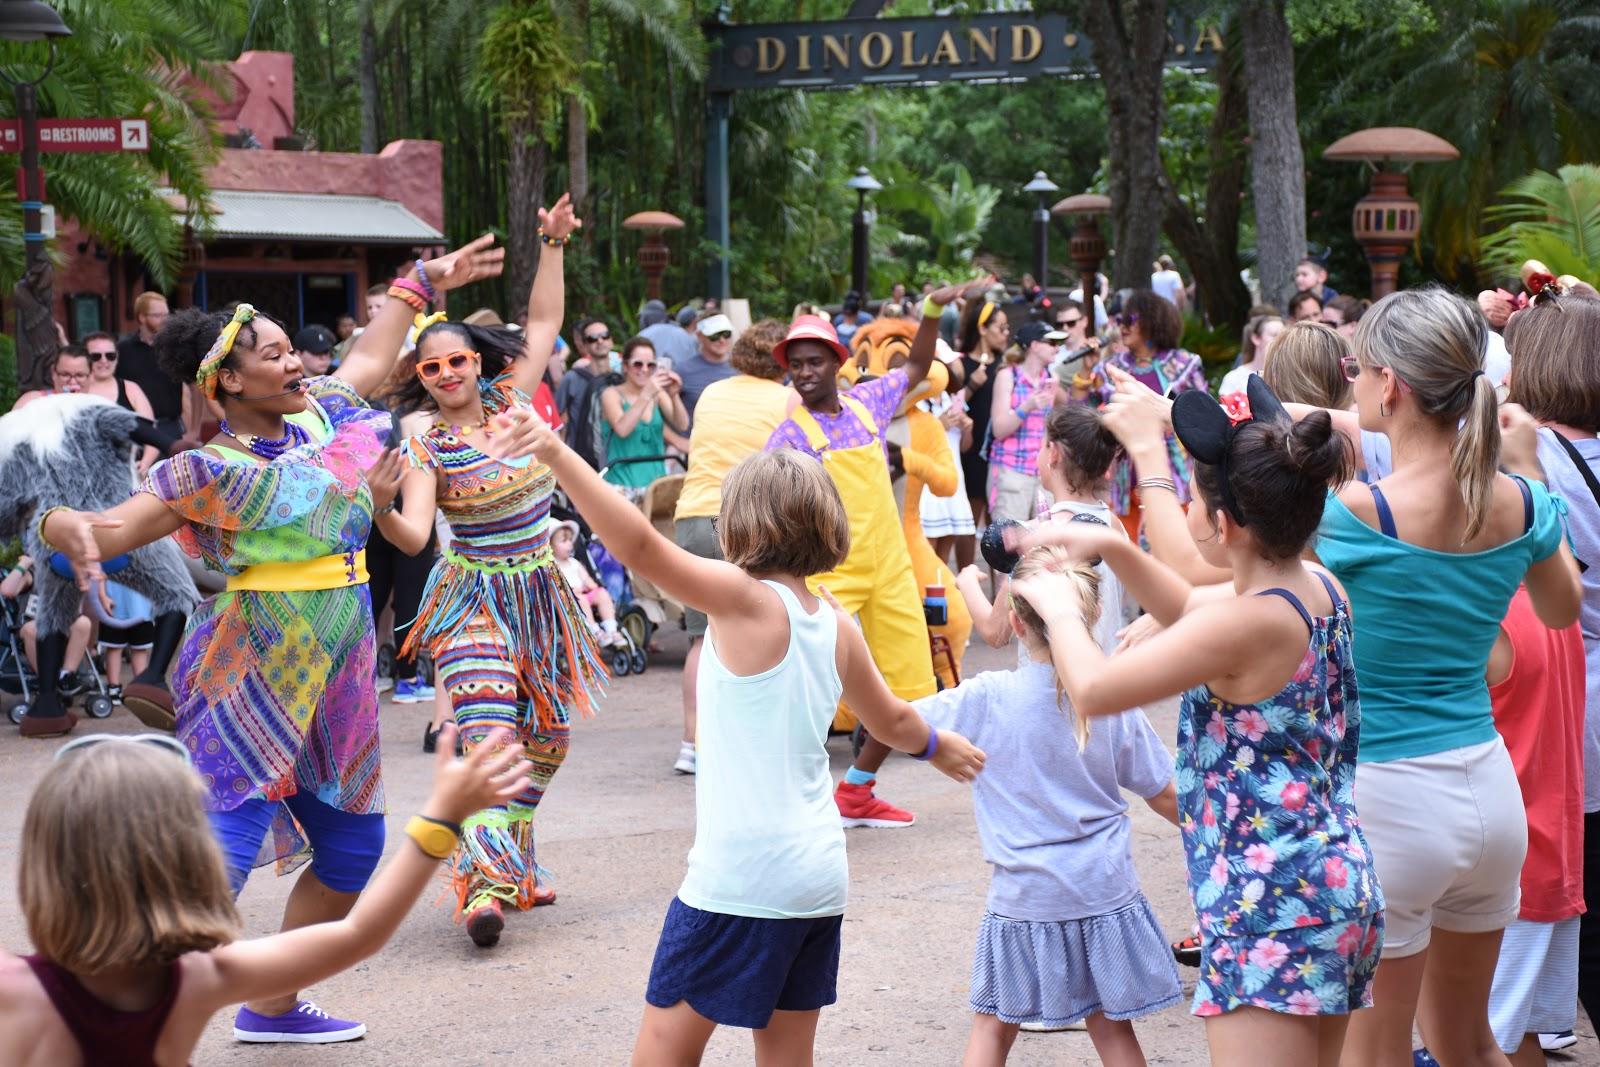 Planning a trip to Disney World